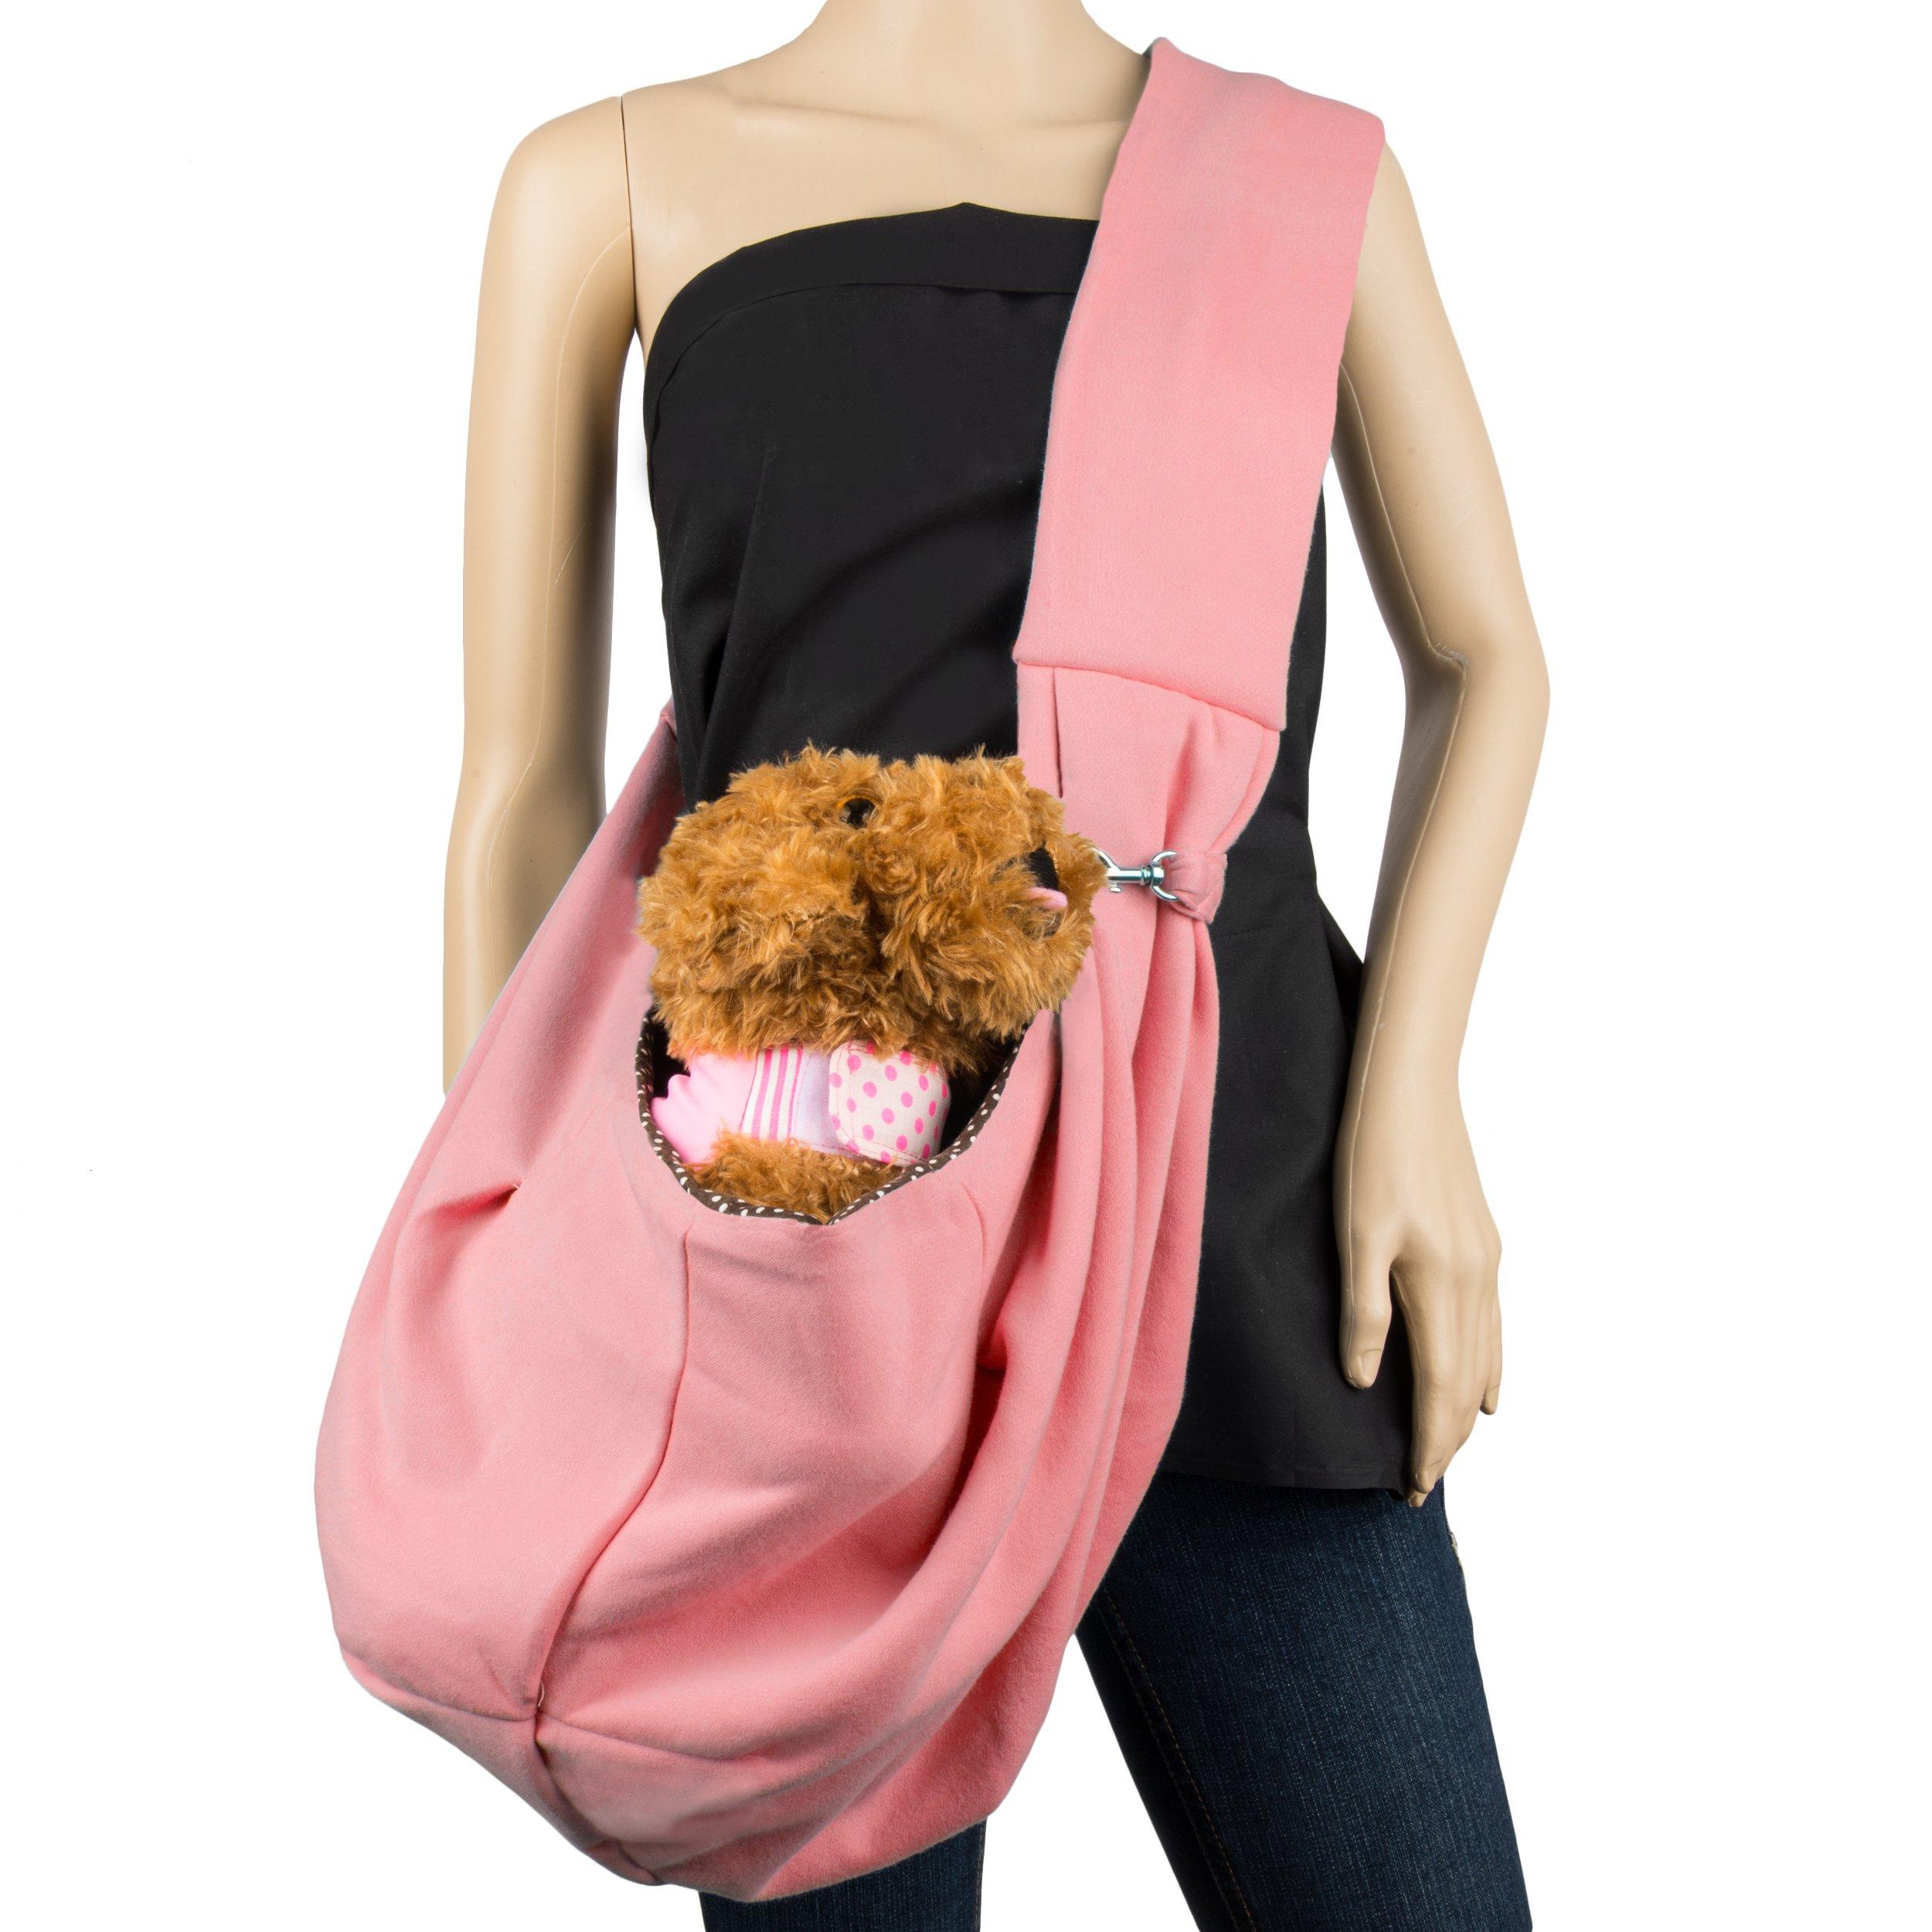 Cue Cue Pet's 100% Plush Cotton Reversible Pet Sling Carrier [Bubble Gum Pink] Suitable for Small to Medium Sized Dogs, Cats, Rabbits, Pet's by CUE CUE Pet